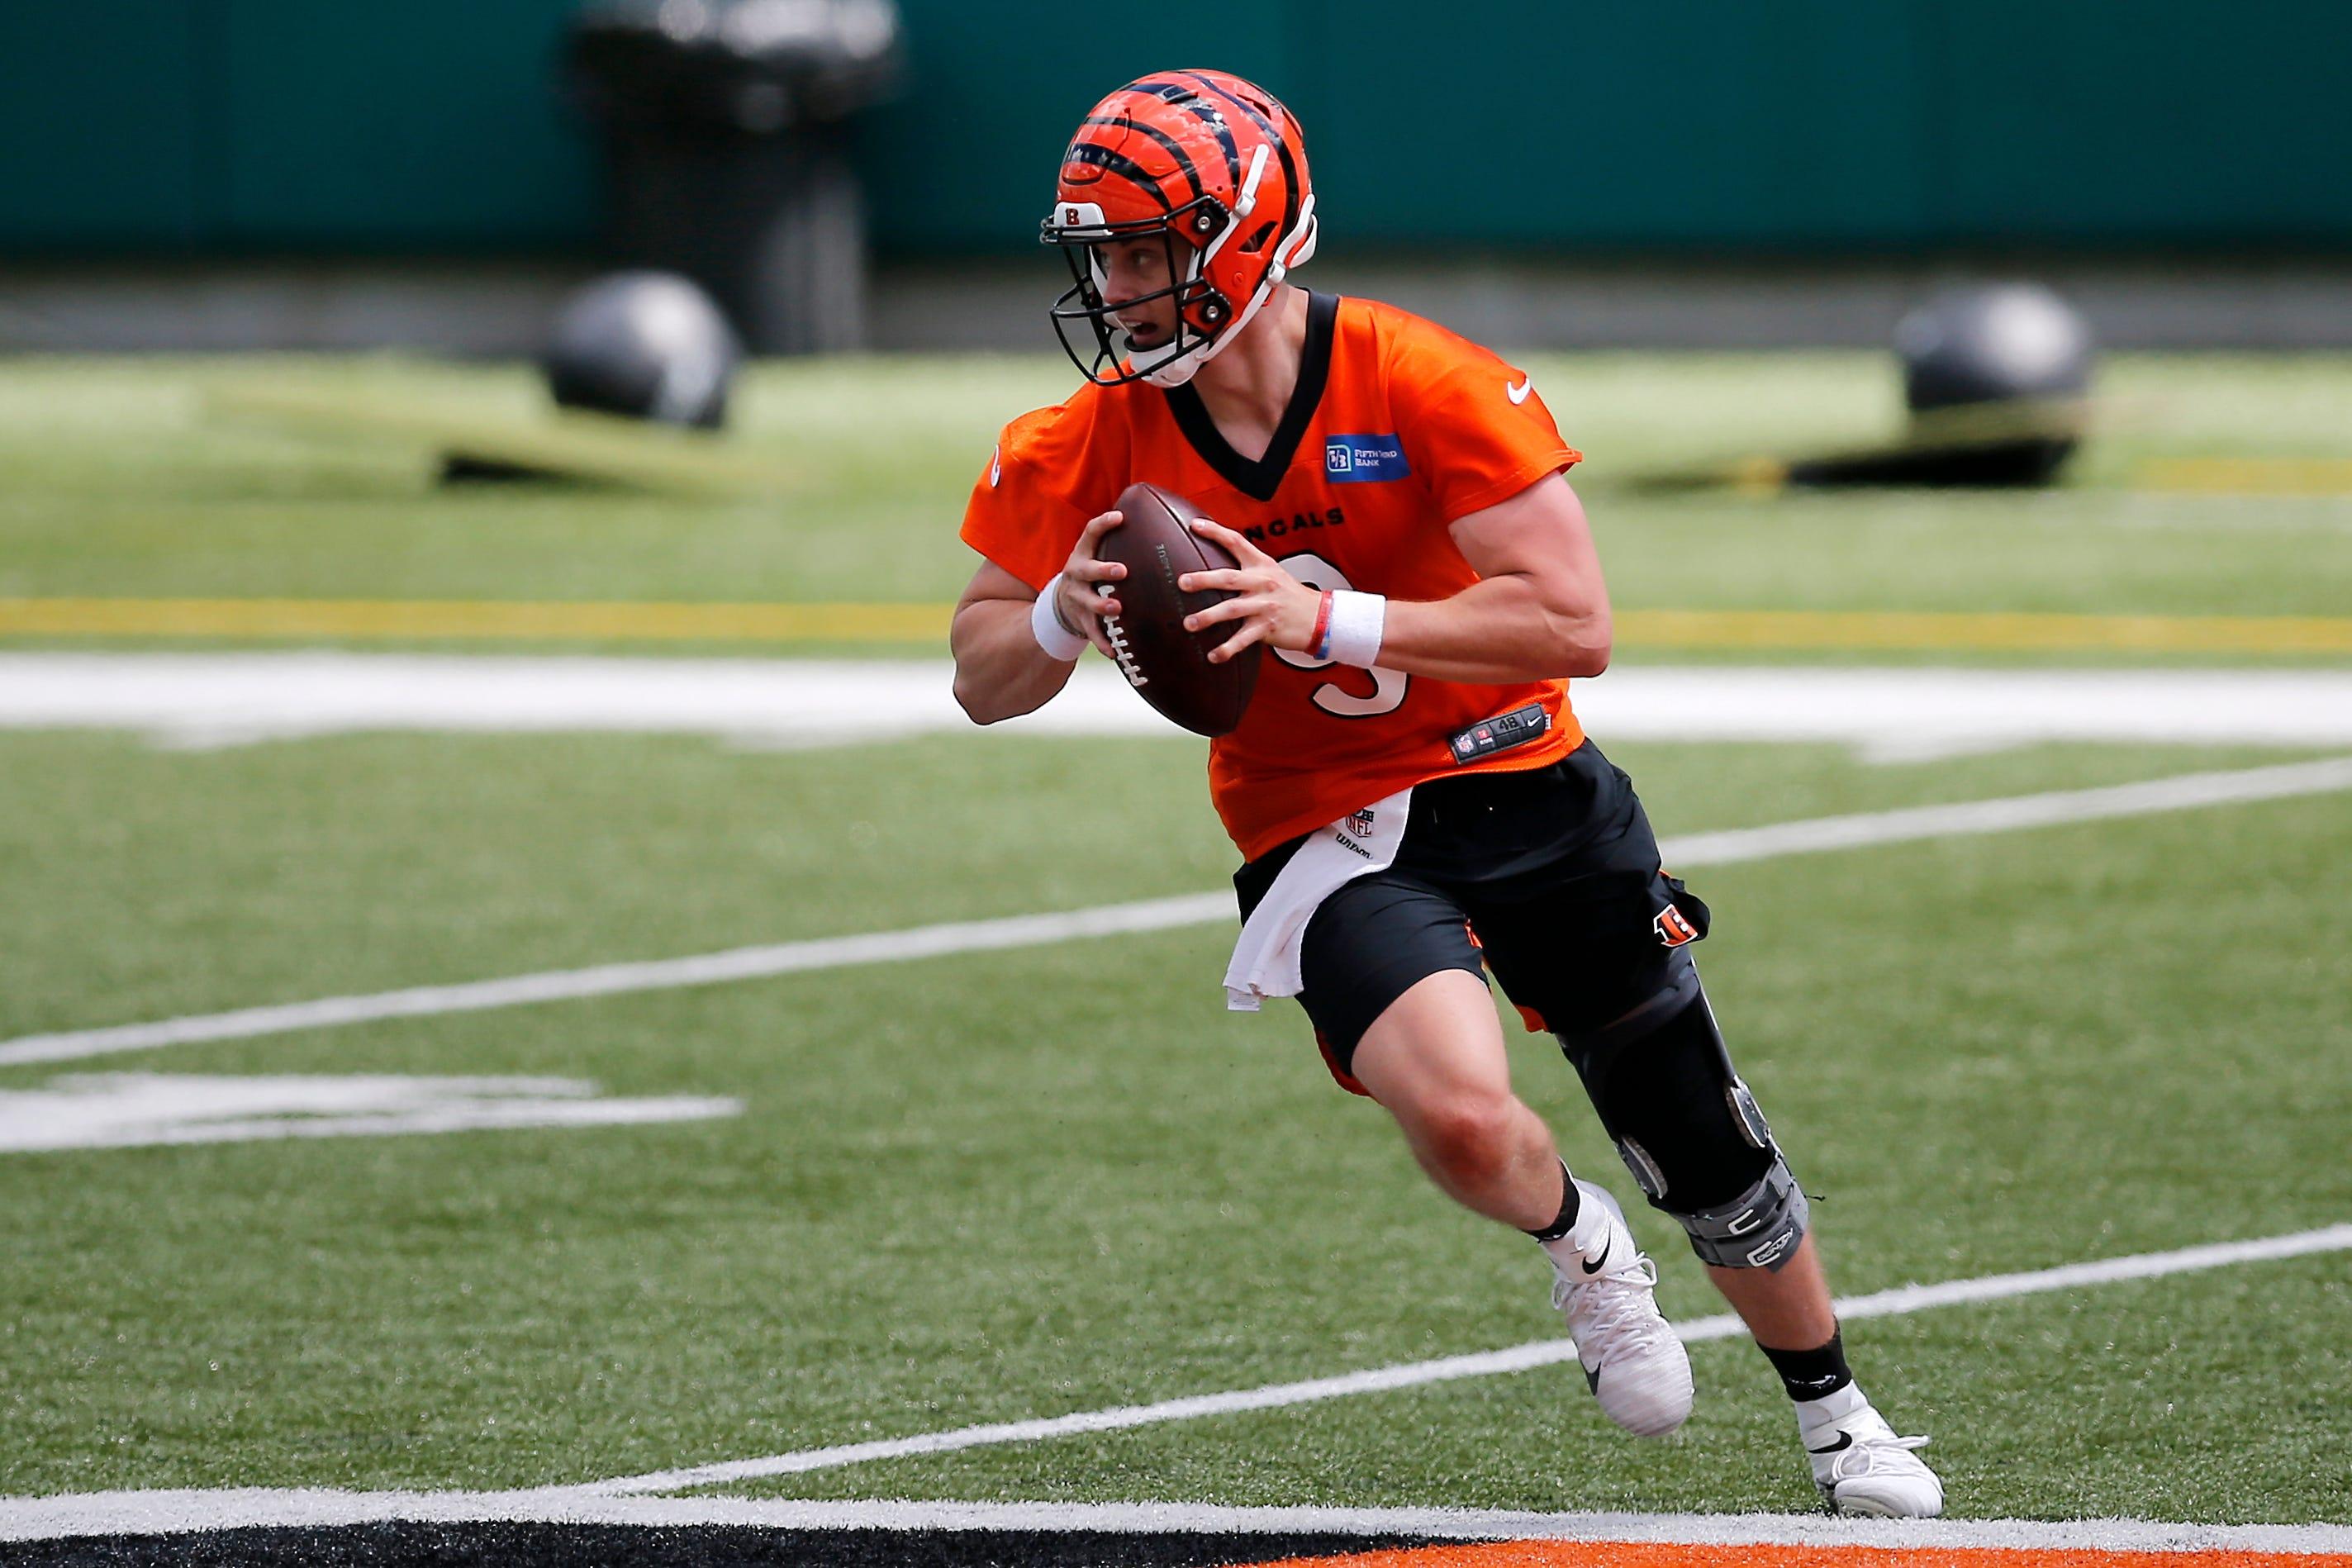 Bengals QB Joe Burrow confident he'll be ready for comeback at start of 2021 NFL season